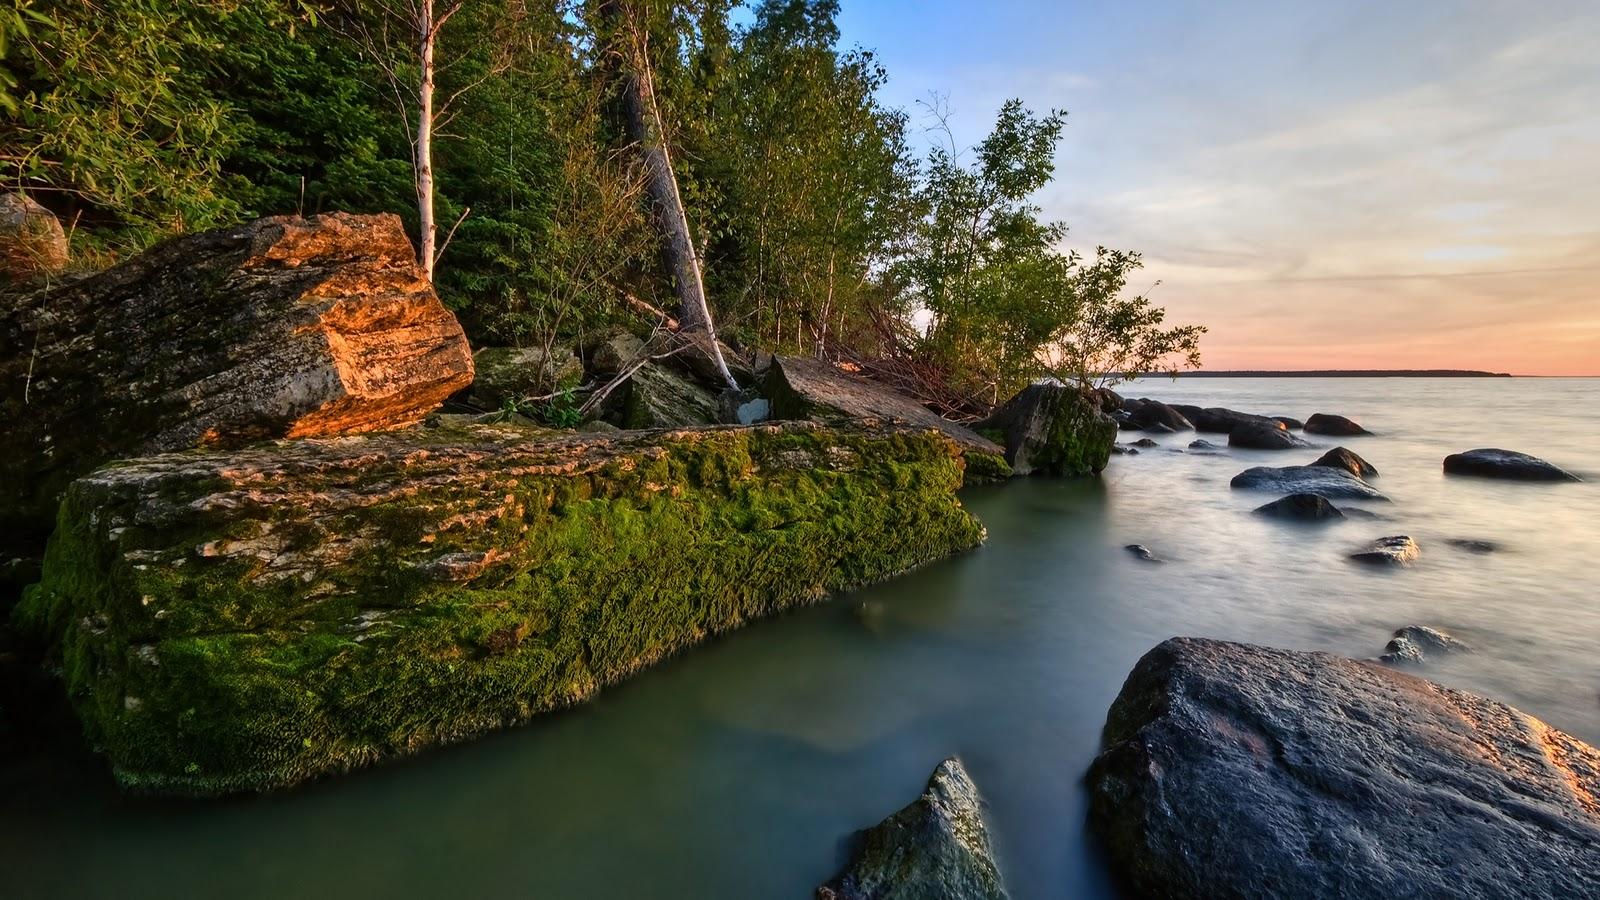 http://3.bp.blogspot.com/-339j_2knp4k/TsvIKSQki2I/AAAAAAAAK-8/vMhaAPdBX0U/s1600/nature+wallpaper+hd+1080ps.jpg